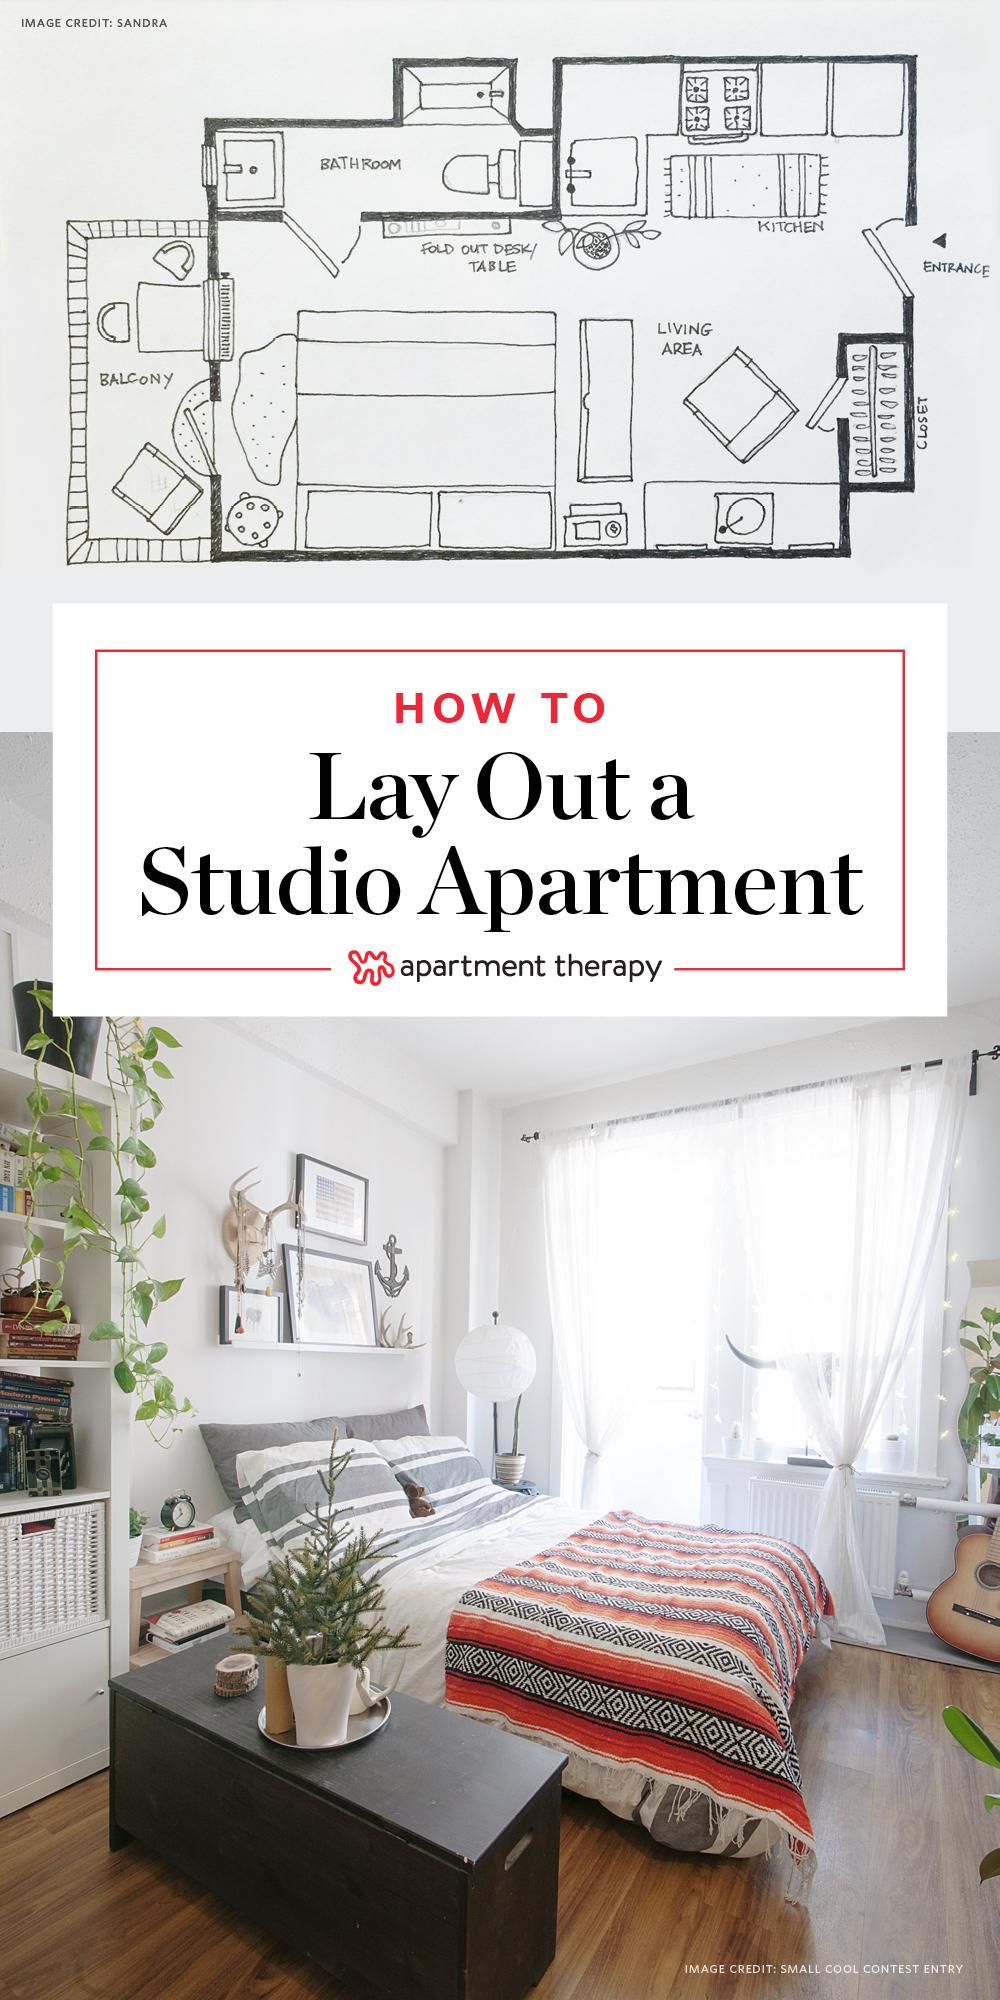 Design Your Own Bedroom App Fair 5 Studio Apartment Layouts That Work  Studio Apartment Layout Design Decoration